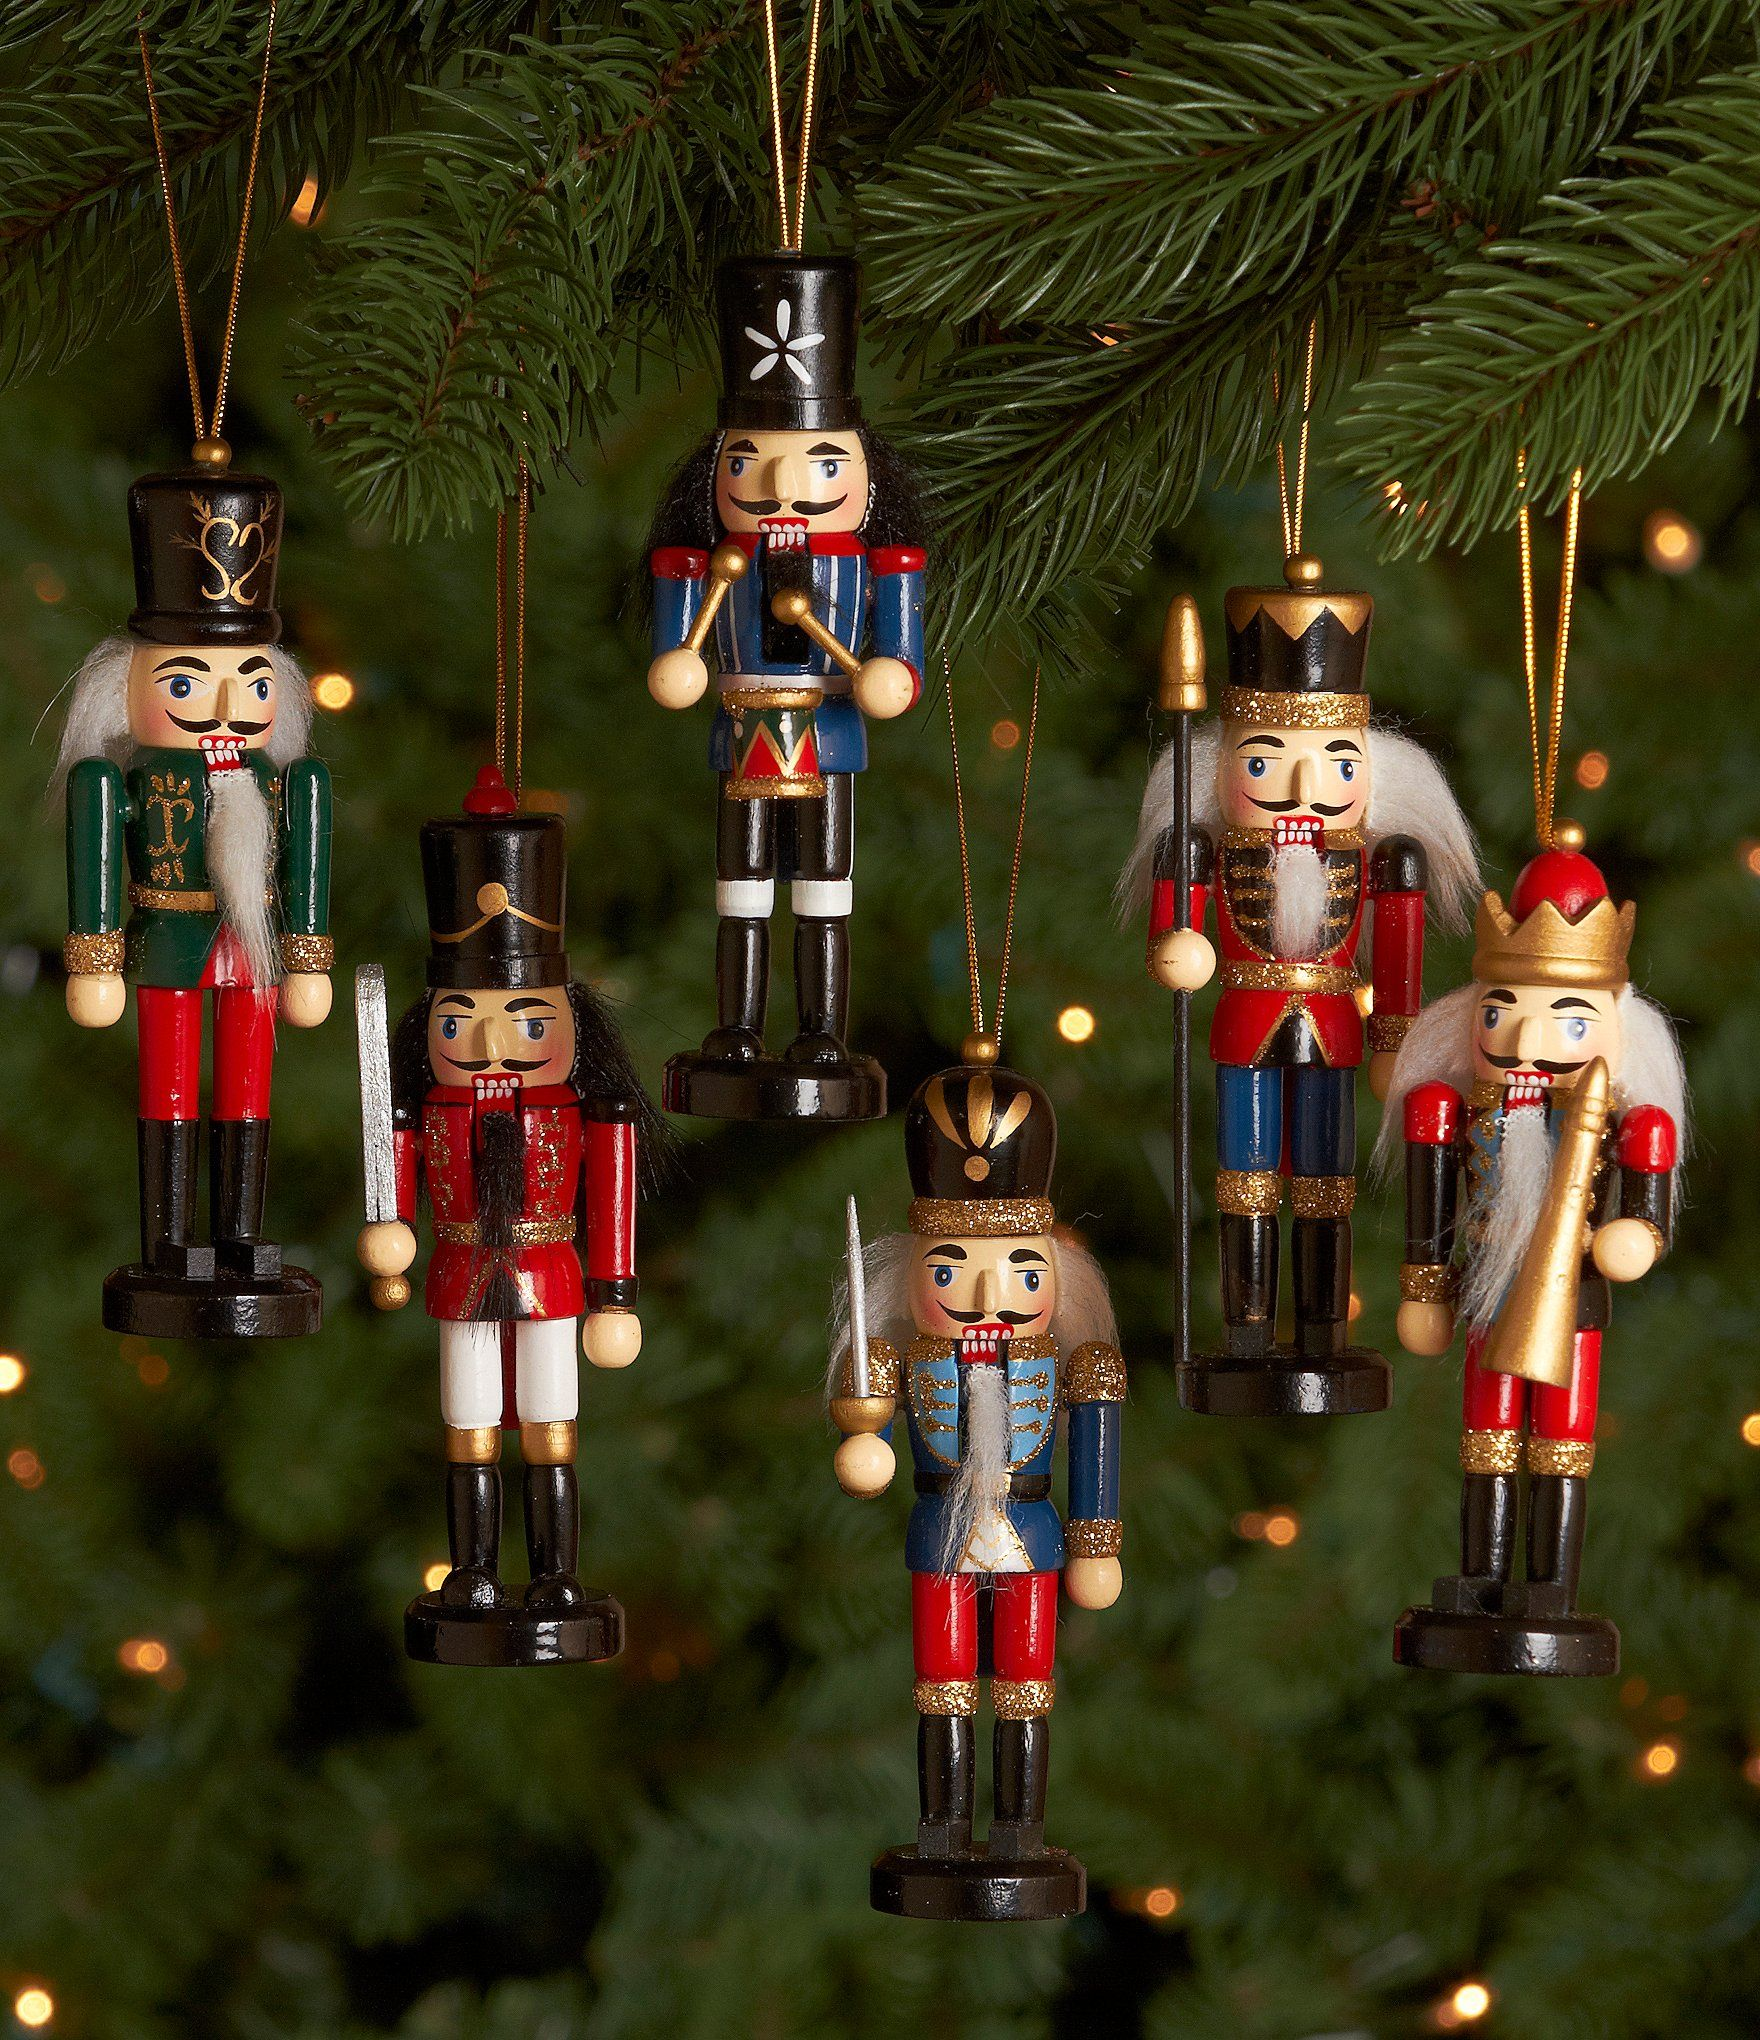 Shop for Dillards Trimmings Nutcracker Ornament Set at